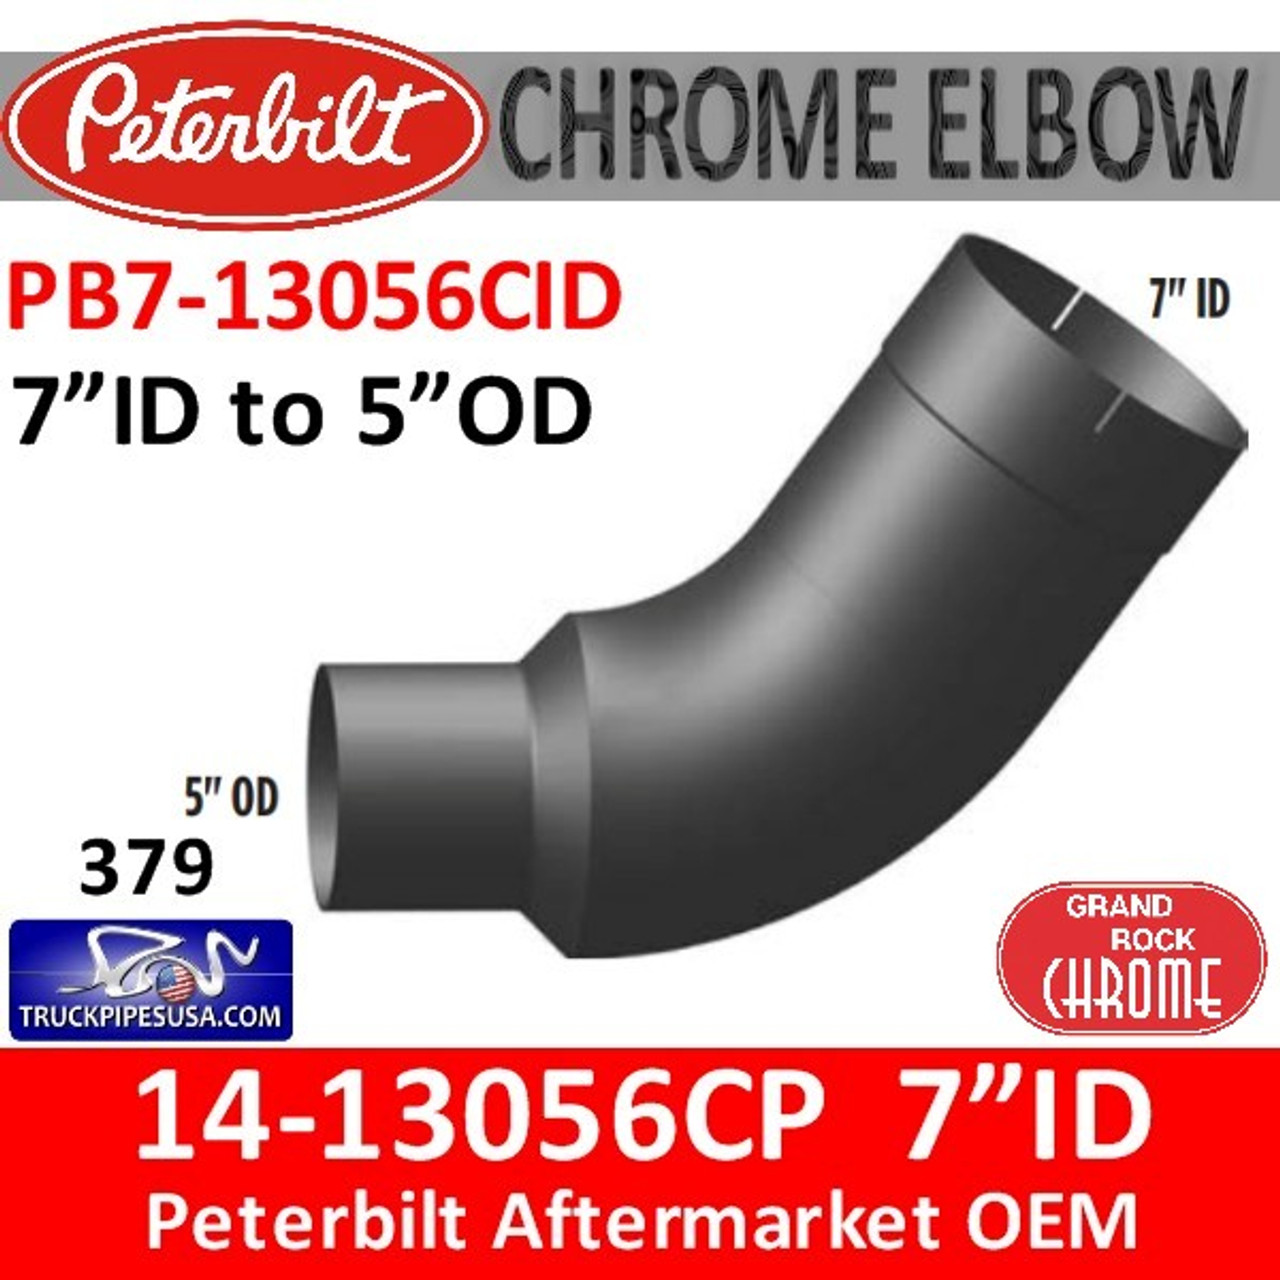 "14-13056 7"" ID to 5"" OD Peterbilt 379 Chrome Elbow PB7-13056CID"